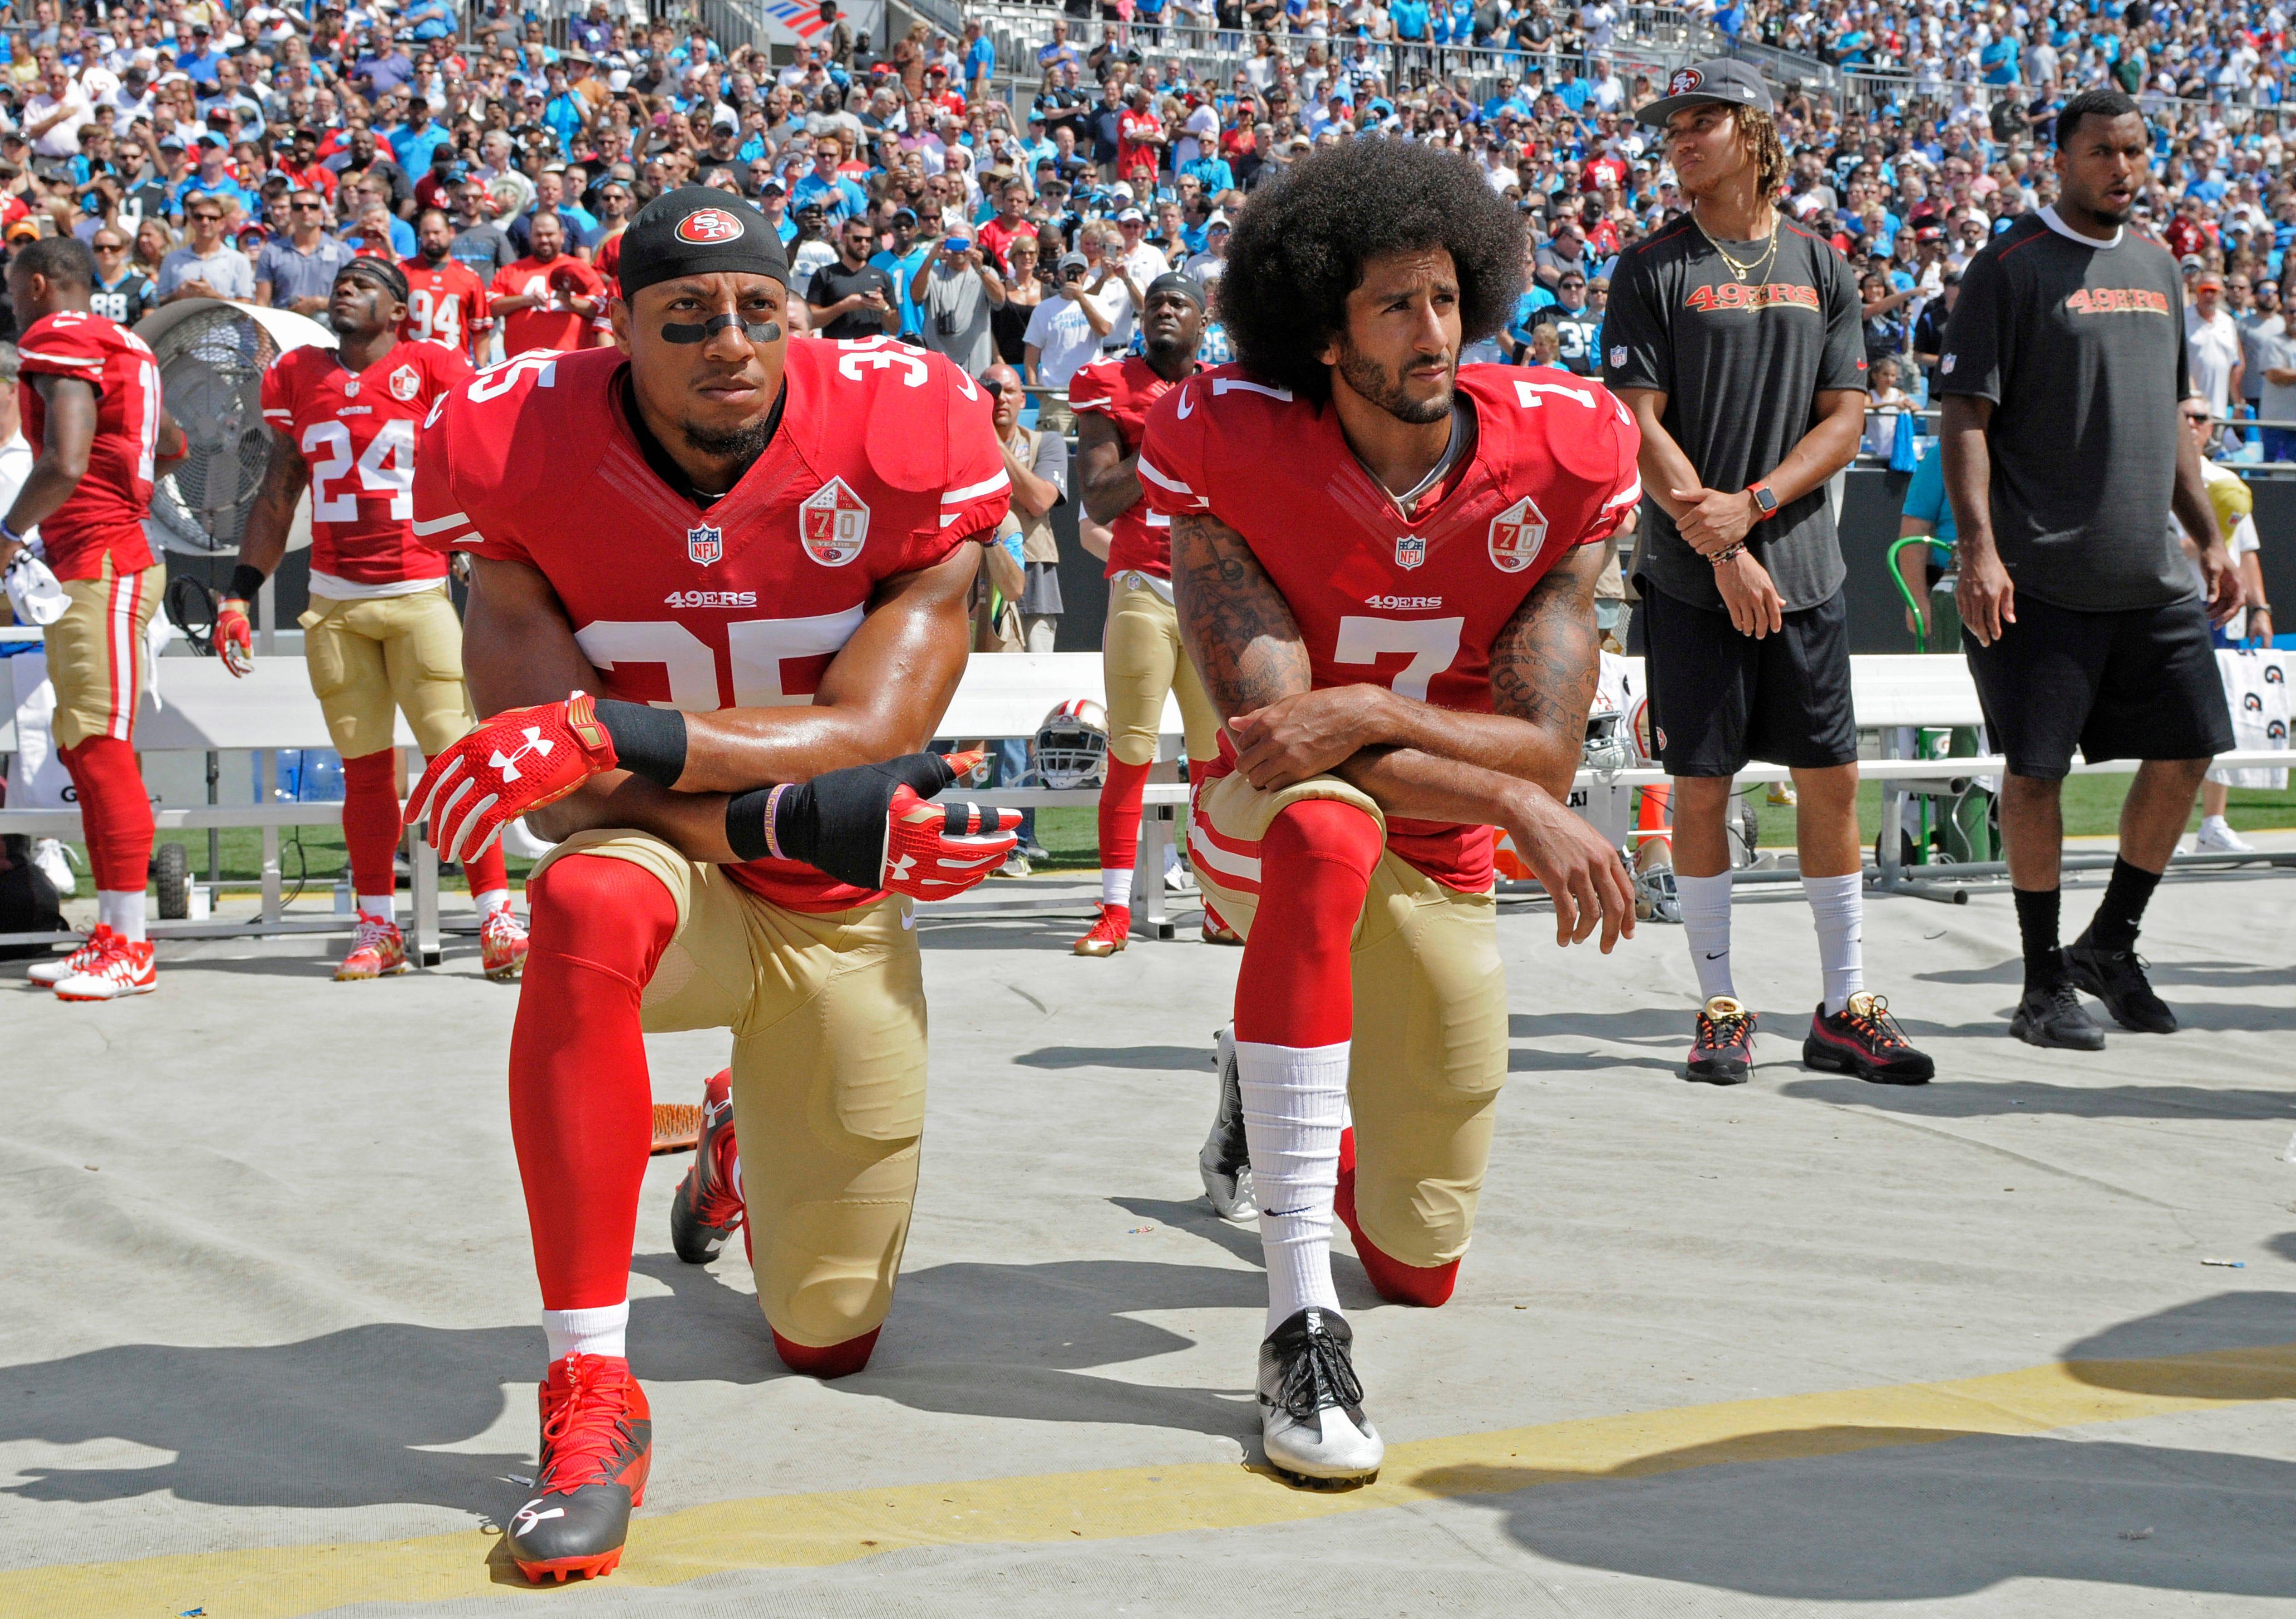 Report: Colin Kaepernick, Eric Reid got less than $10 million in NFL collusion settlement